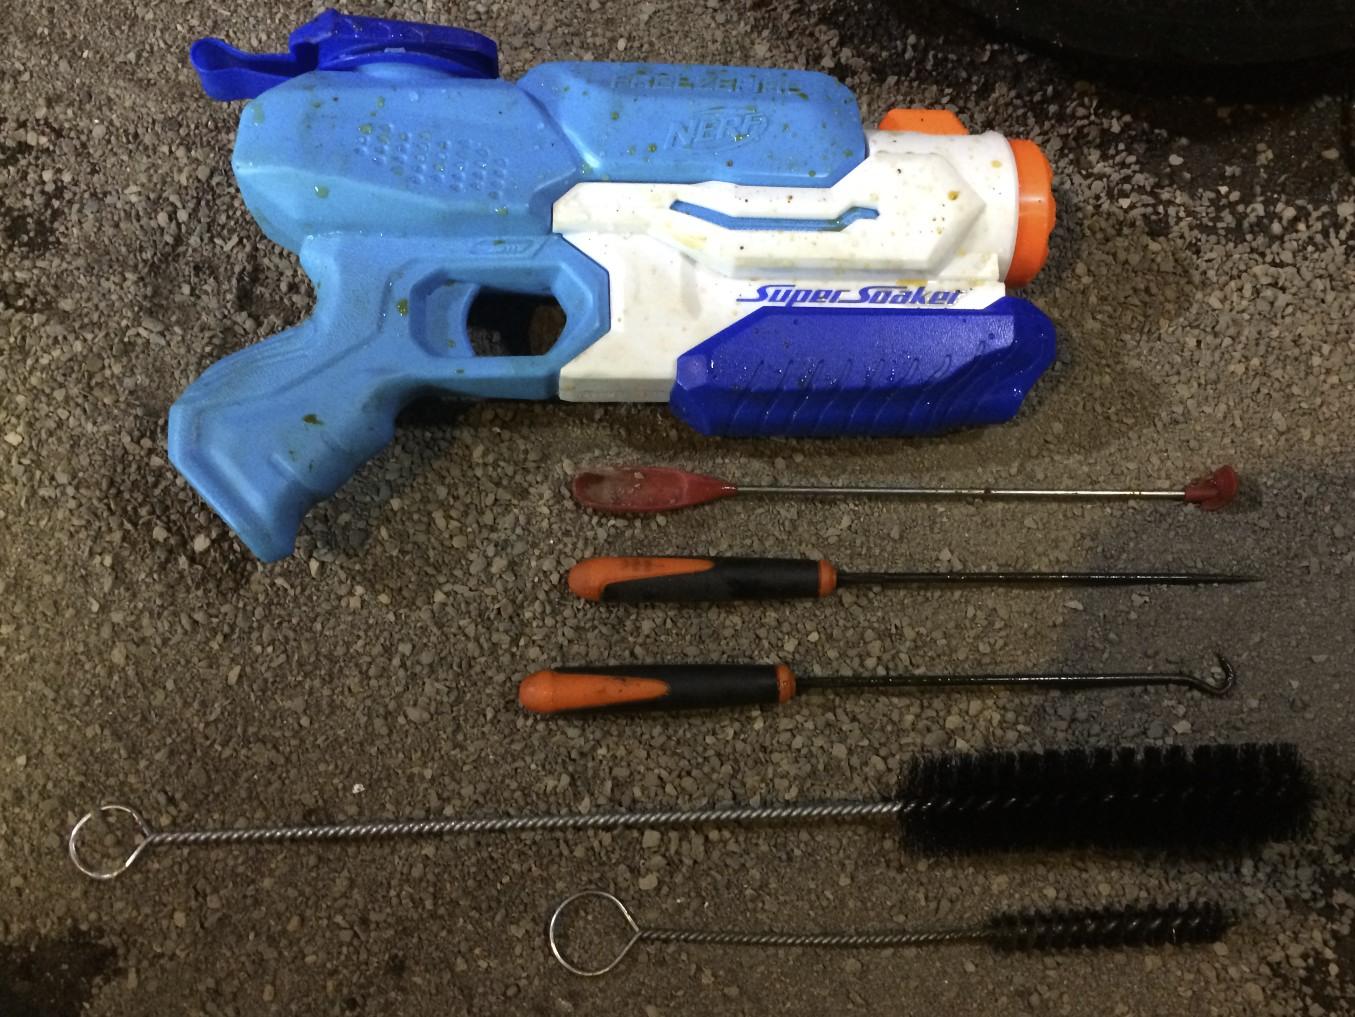 "Super Soaker Freeze Blaster, ""last drop"" spatula, picks, and bristle brushes.,"